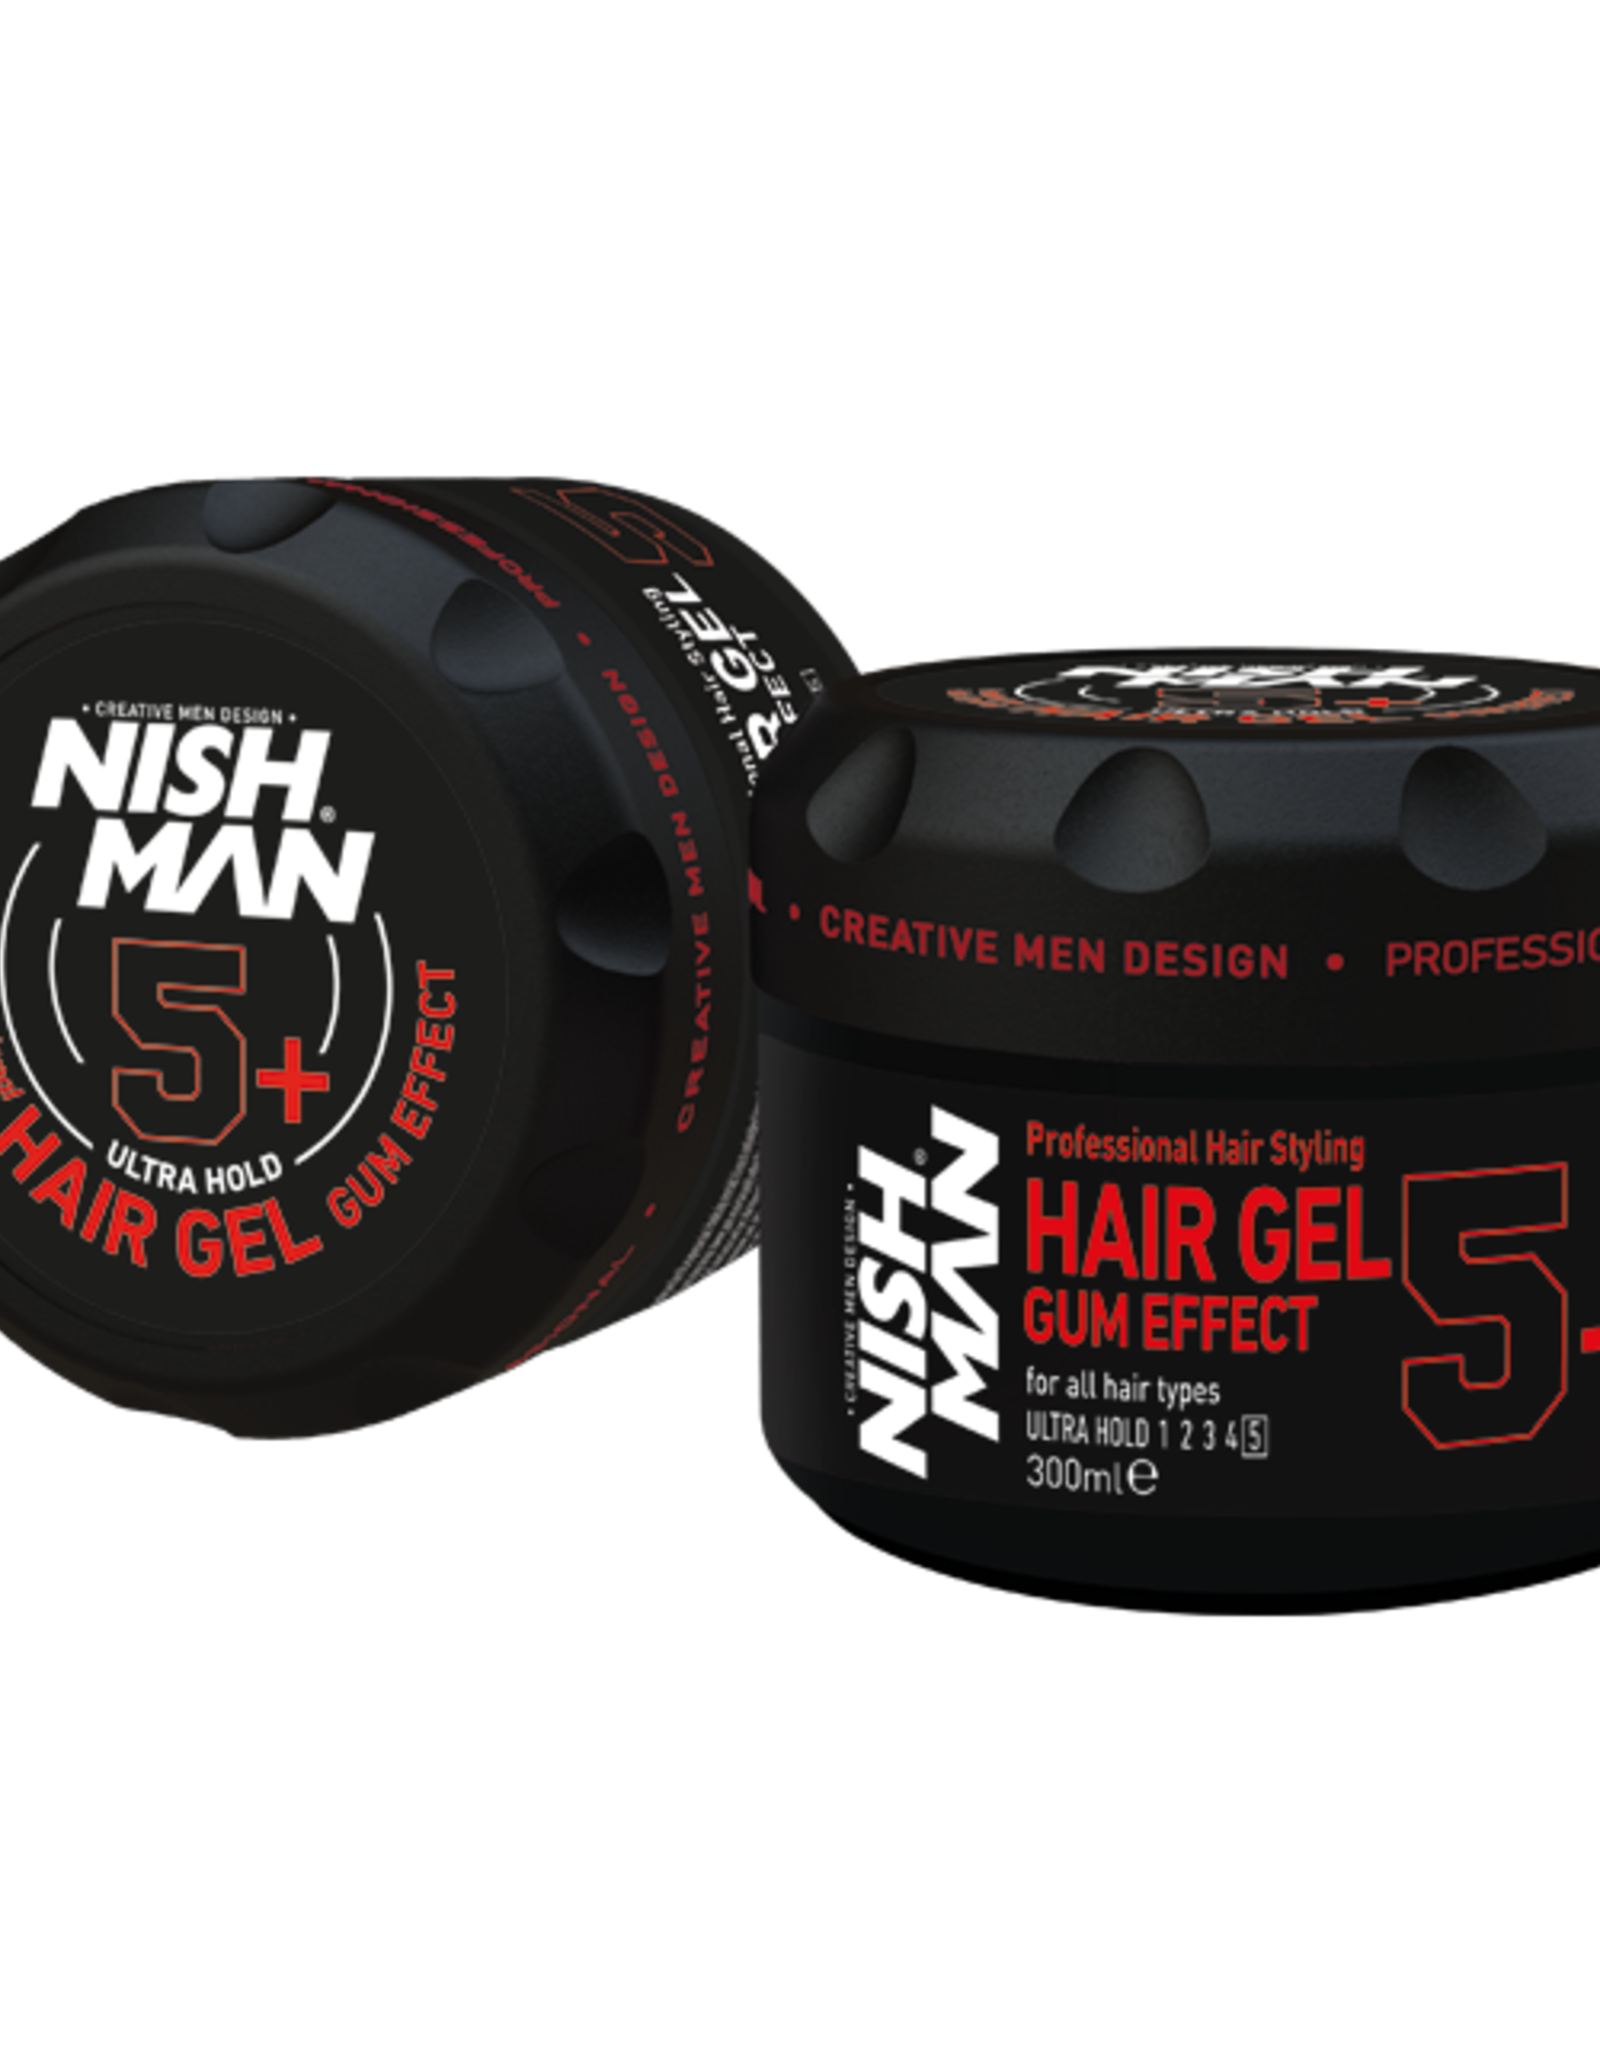 Nishman Hairgel Gum Effect 5+